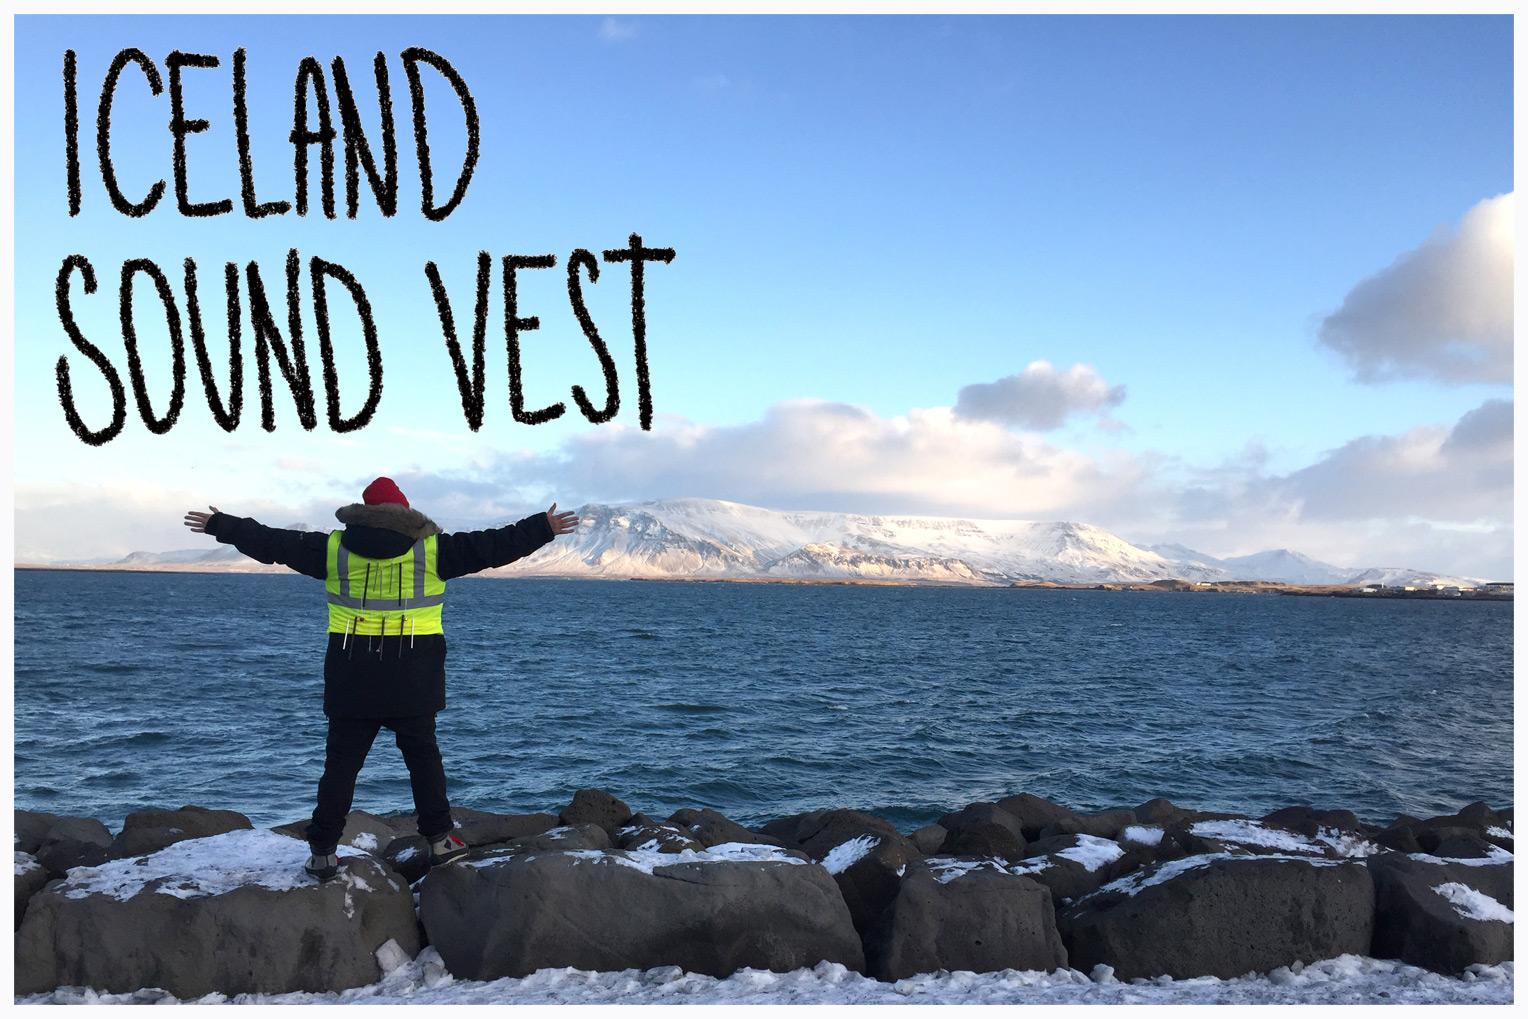 Iceland-Sound-Vest-portrait-1.jpg